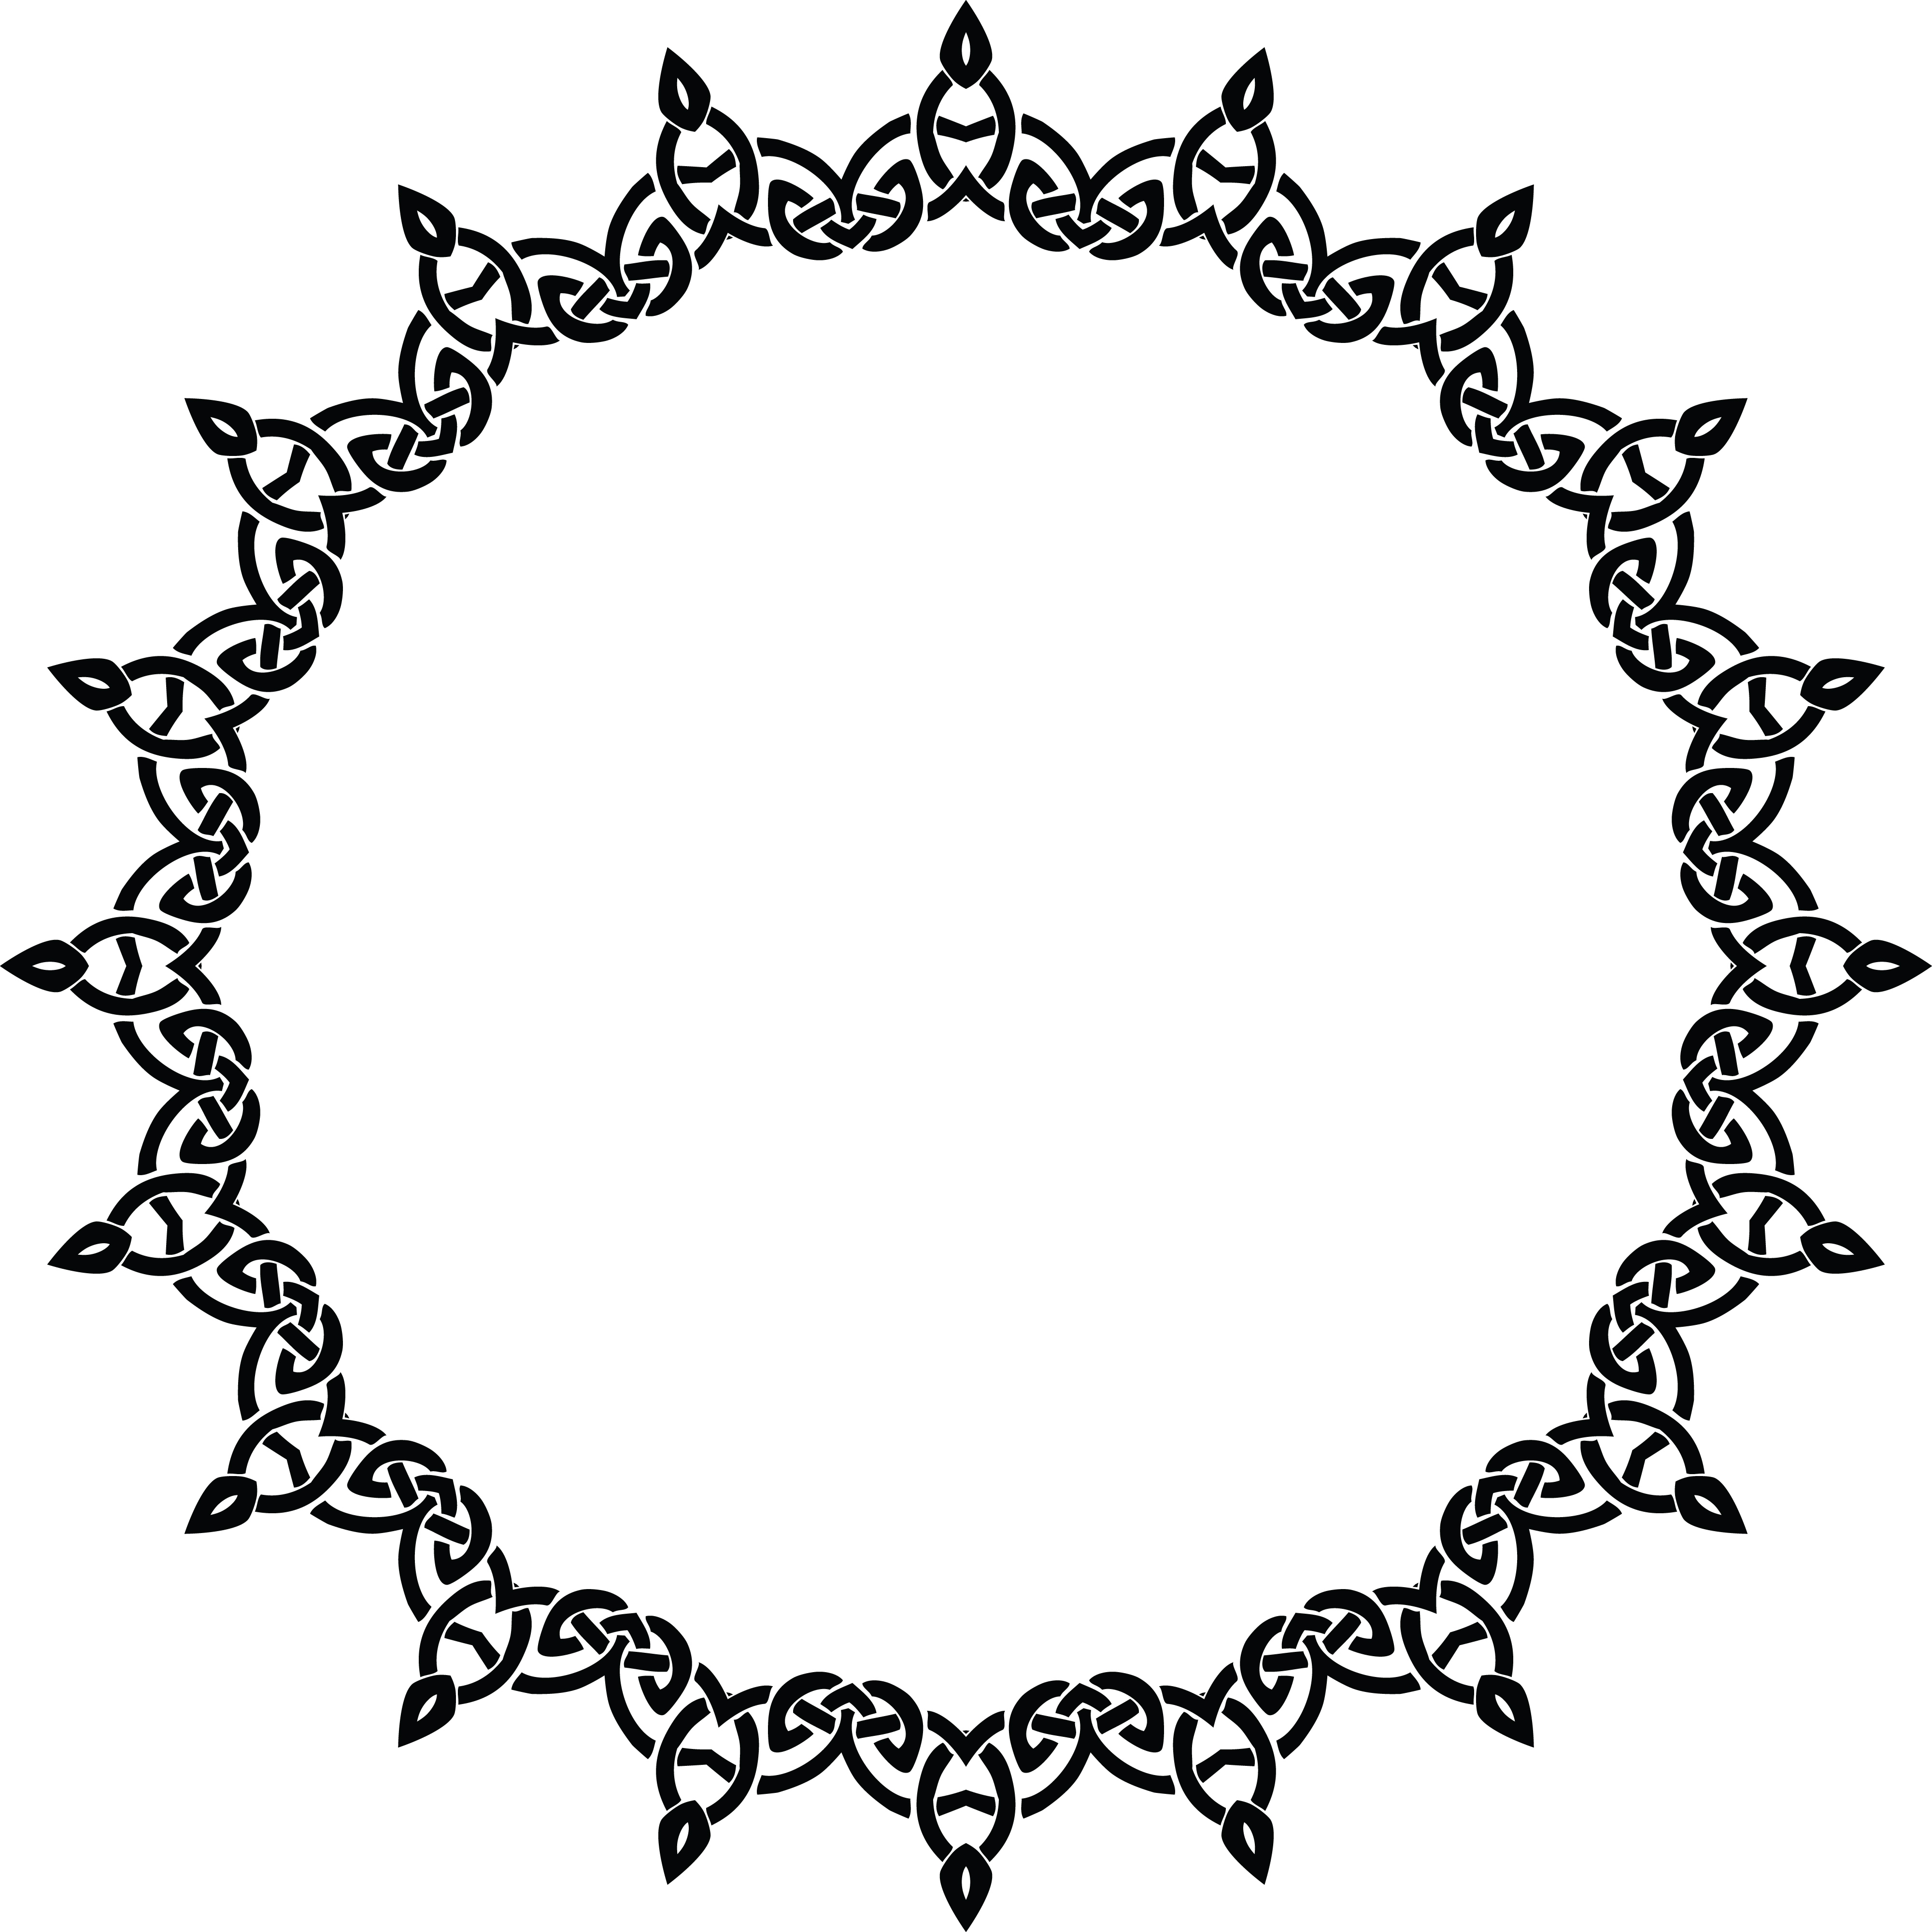 4000x4000 Clipart Of A Celtic Round Frame Border Design Element In Black